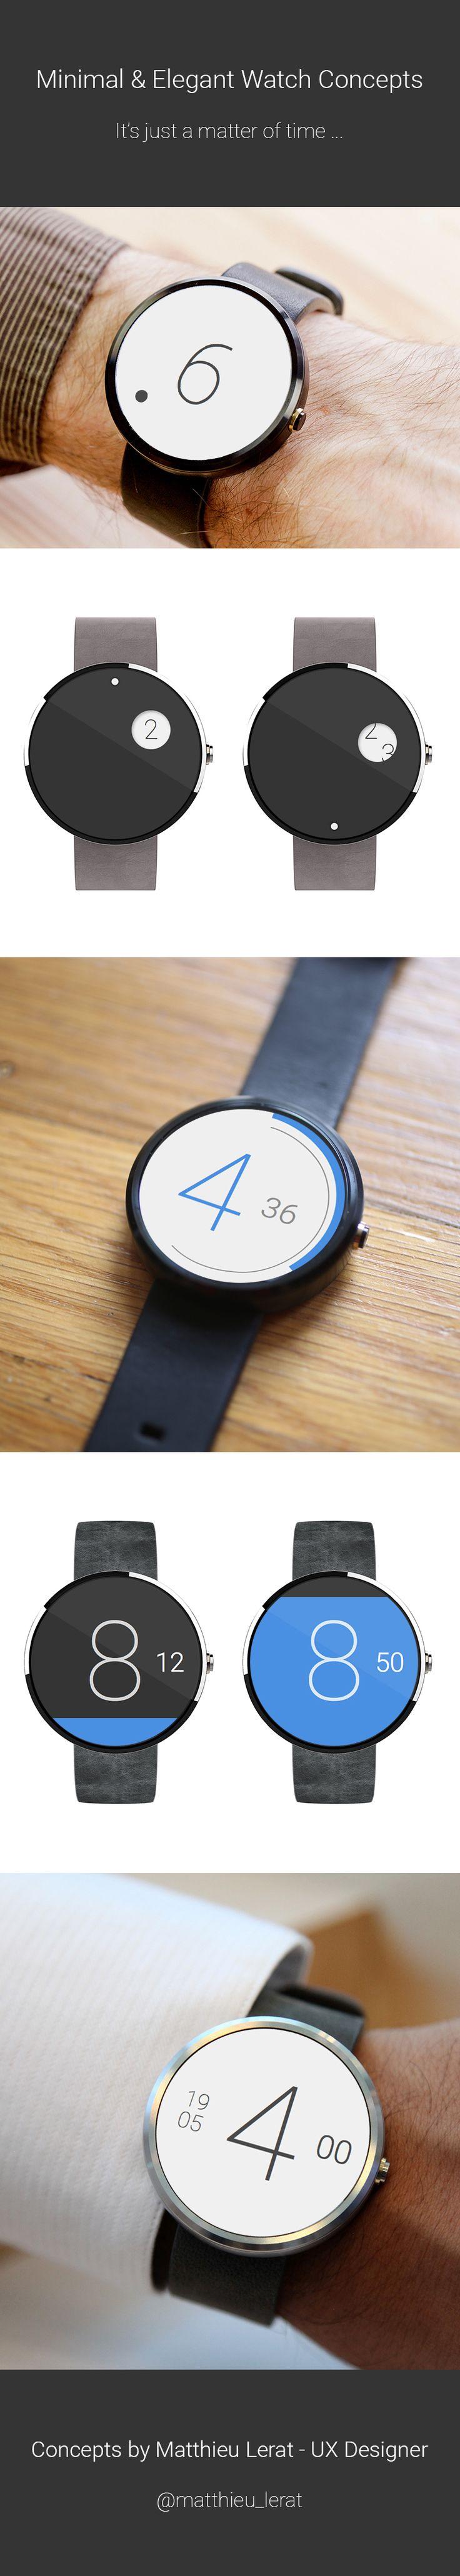 Minimal & Elegant Watch Concept on Behance